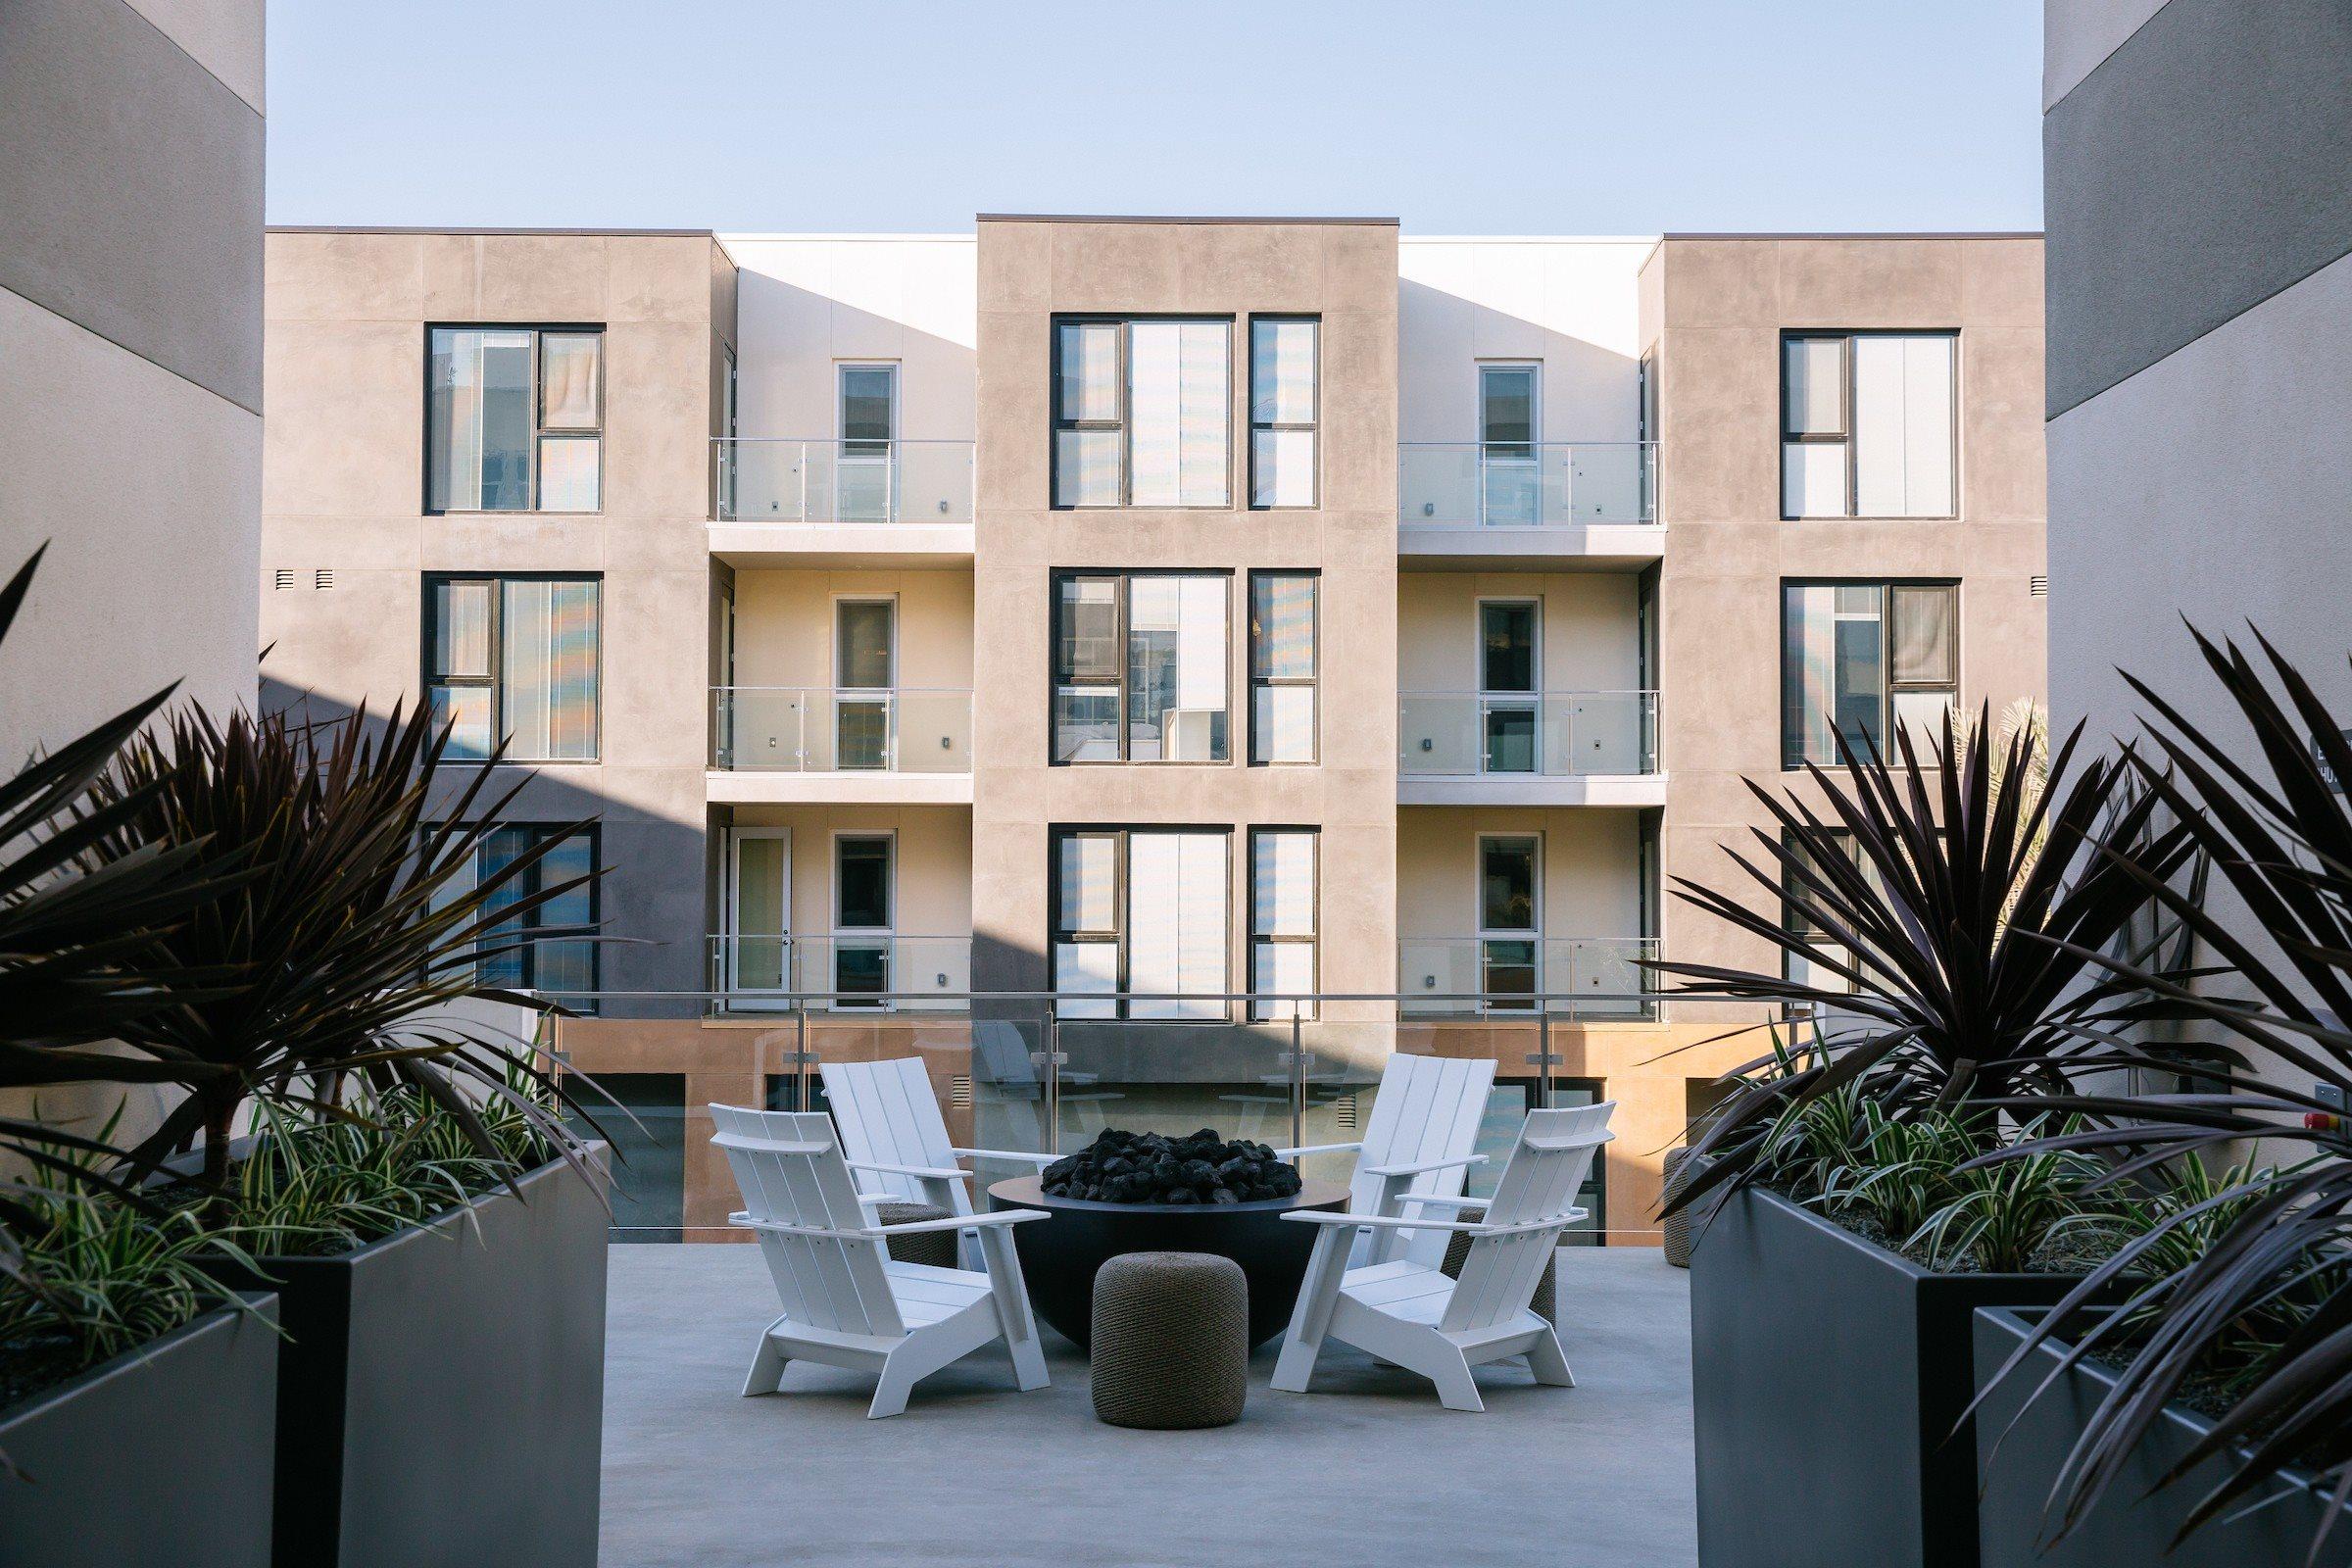 Block C Apartment And Community Amenities